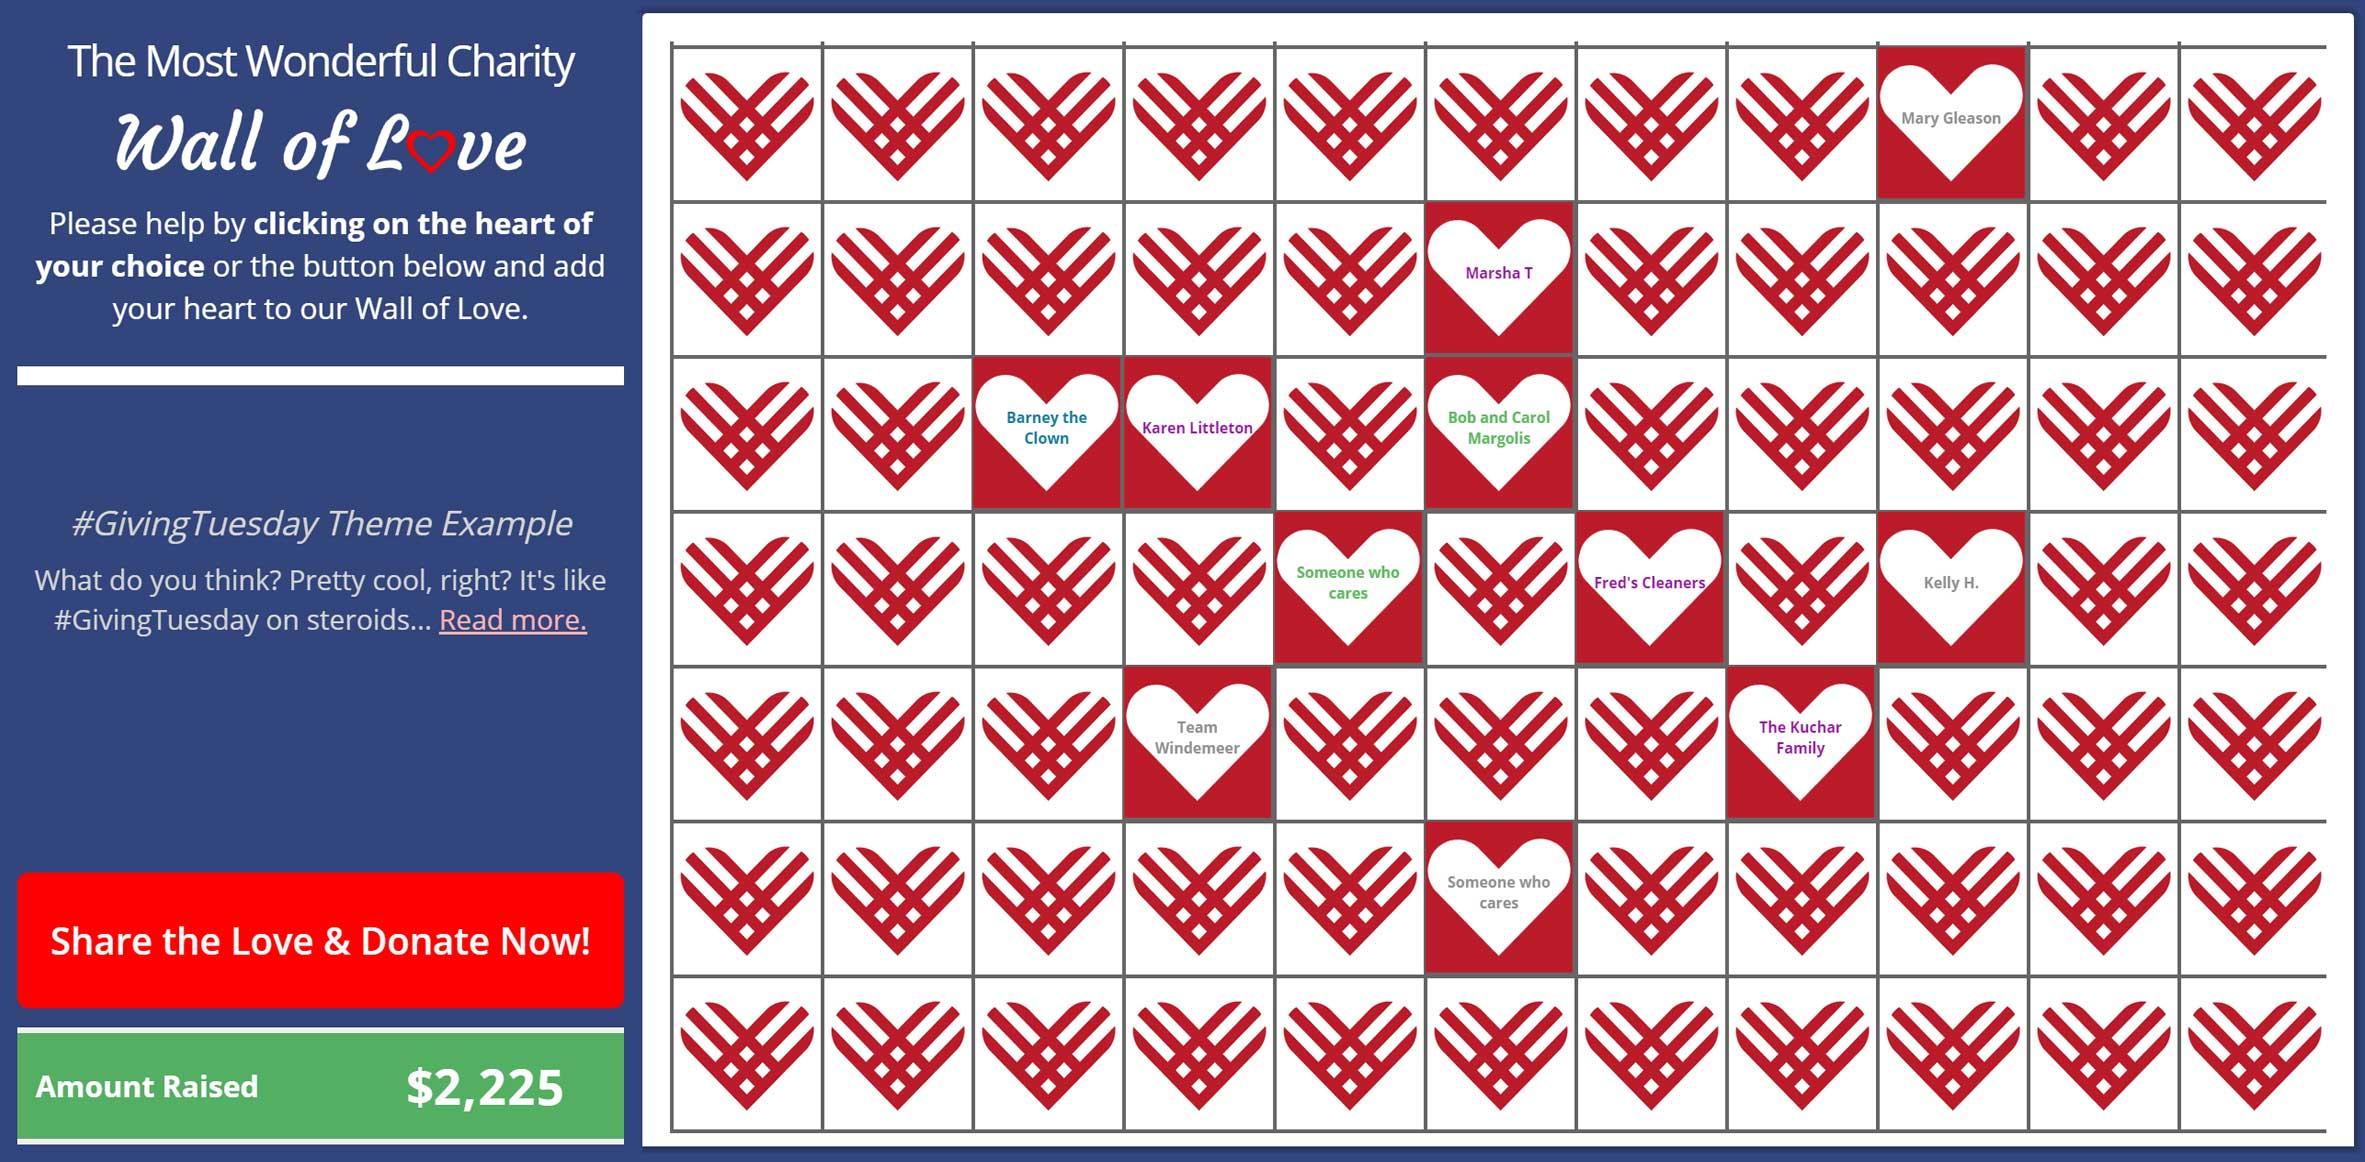 Wall of Love #GivingTuesday